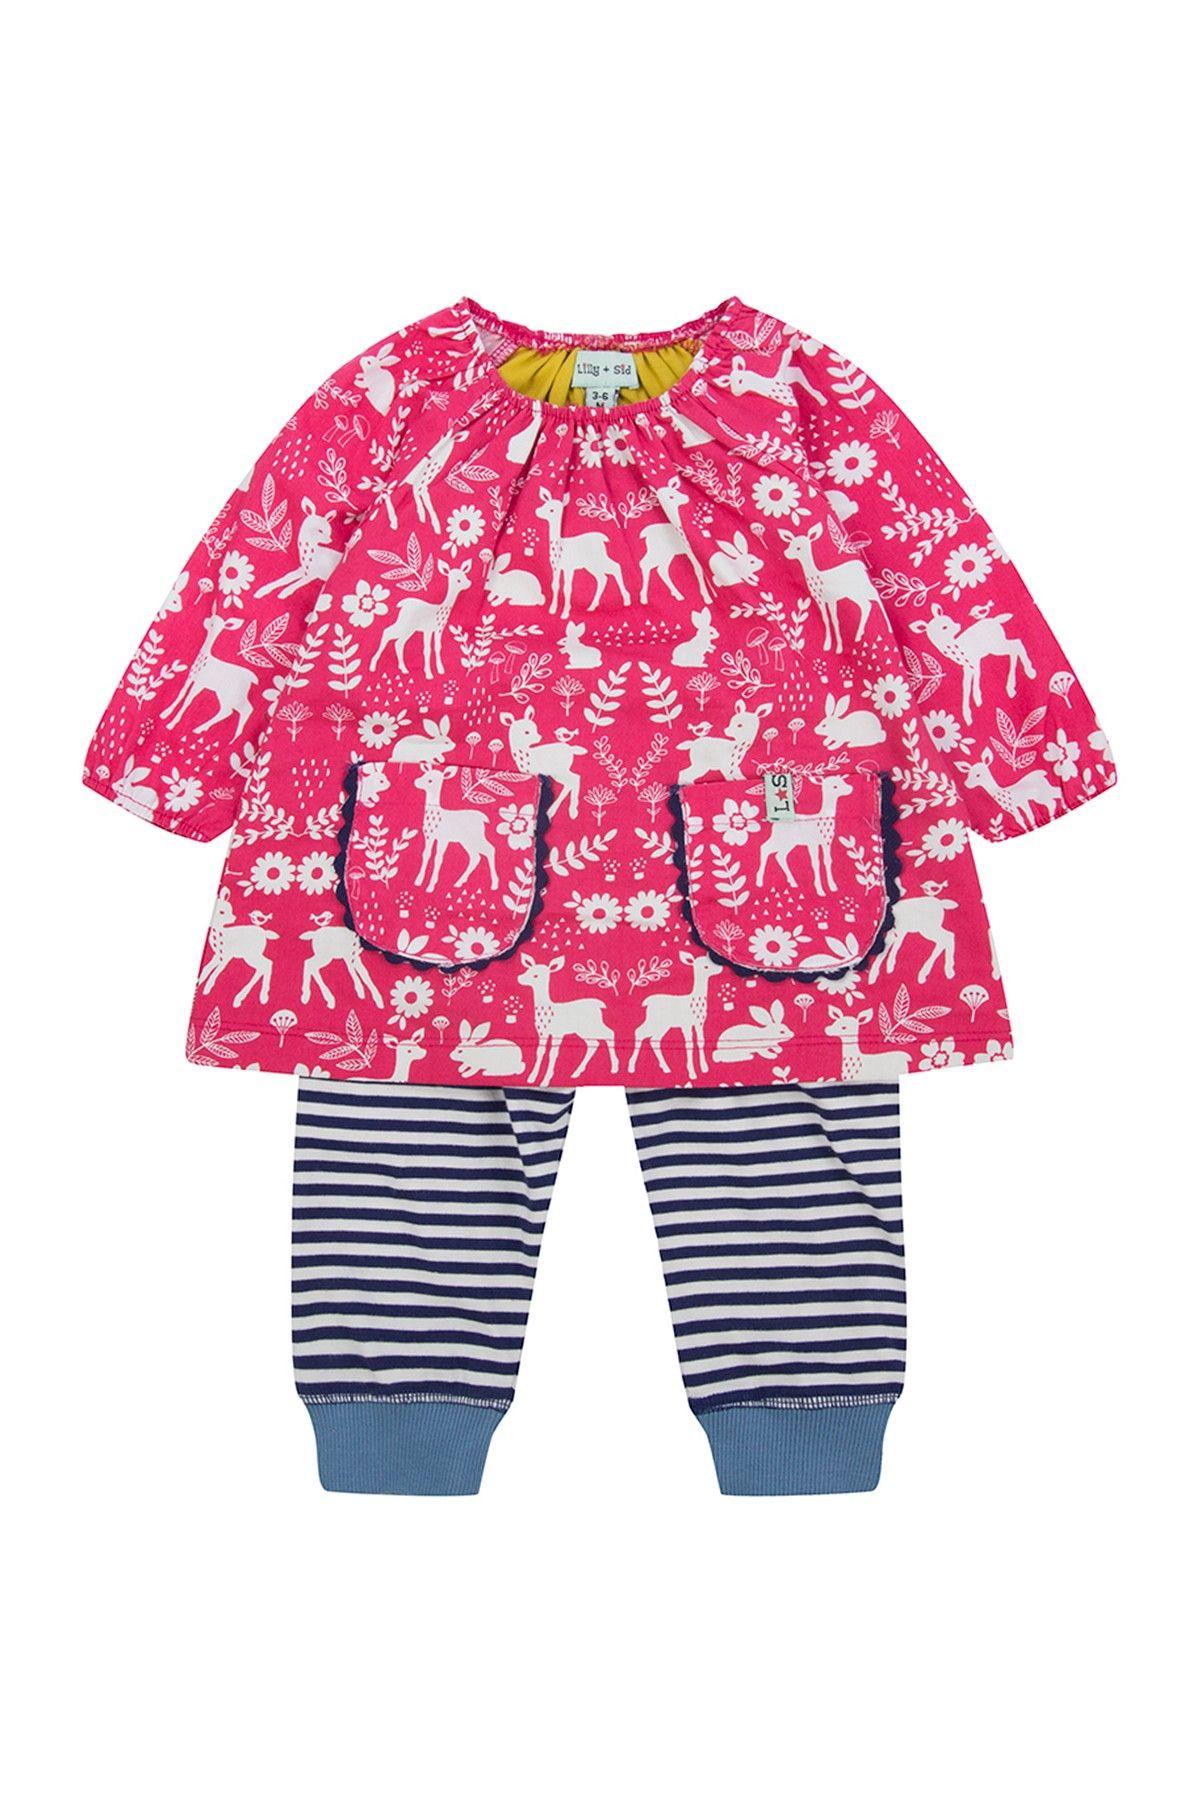 Lilly Sid Woodland Animals Dress & Striped Legging Set Baby Girls